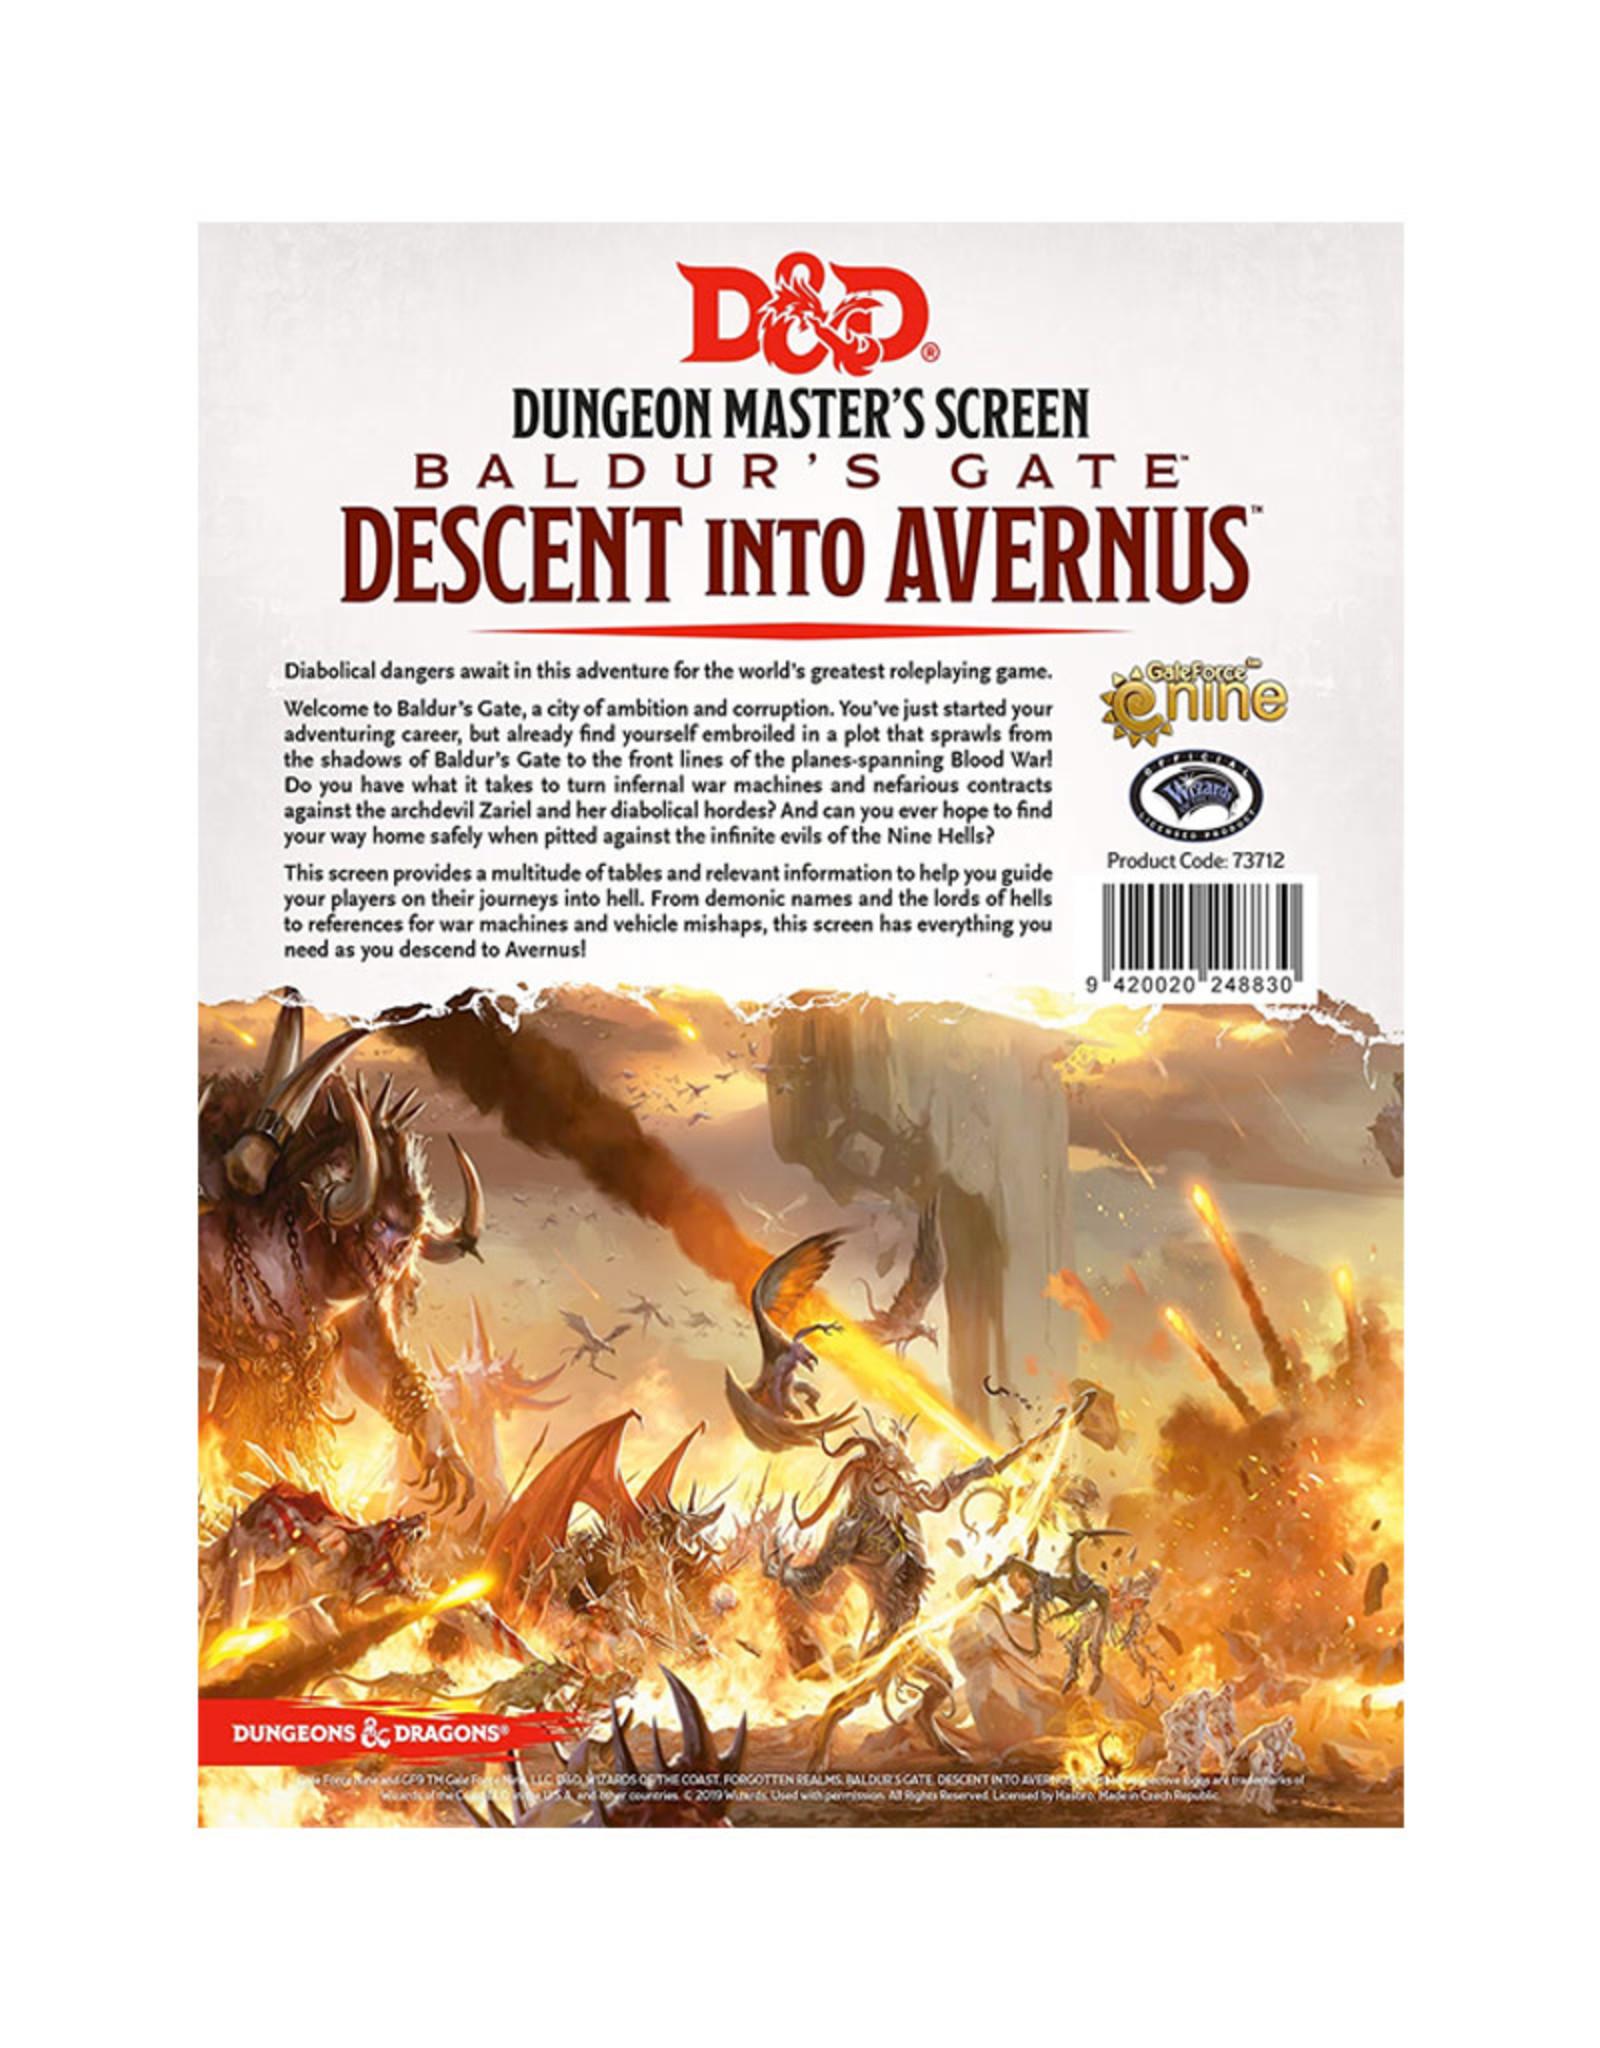 Gale Force 9 D&D RPG: Baldur's Gate Descent into Avernus GM Screen